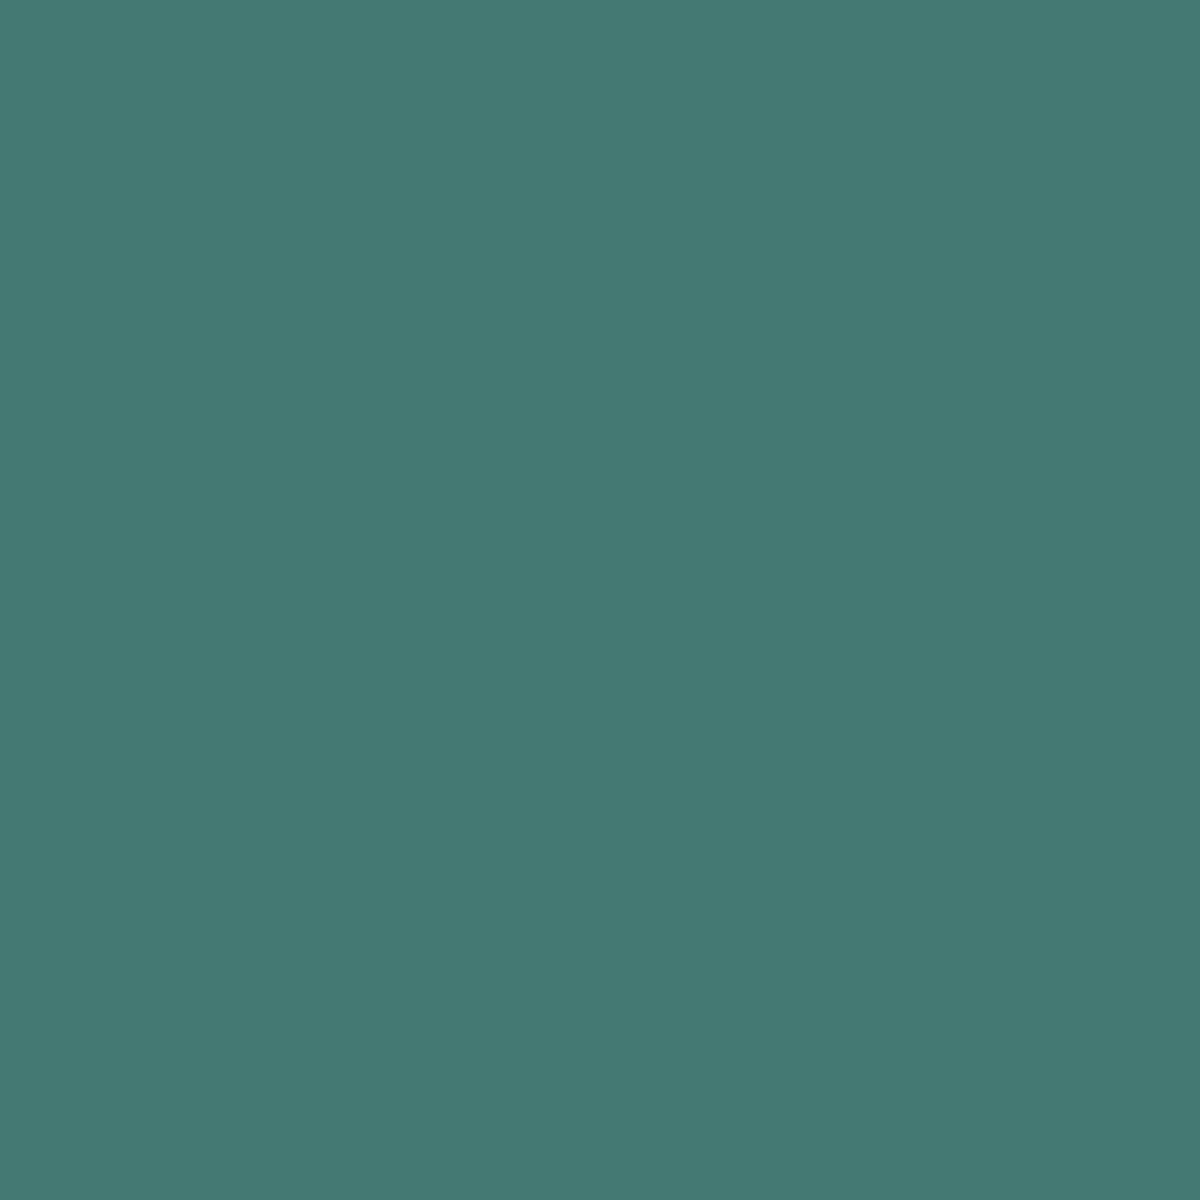 Vopsea lavabilă Chalkboard Newport Green, Benjamin Moore, 1 litru / cutie